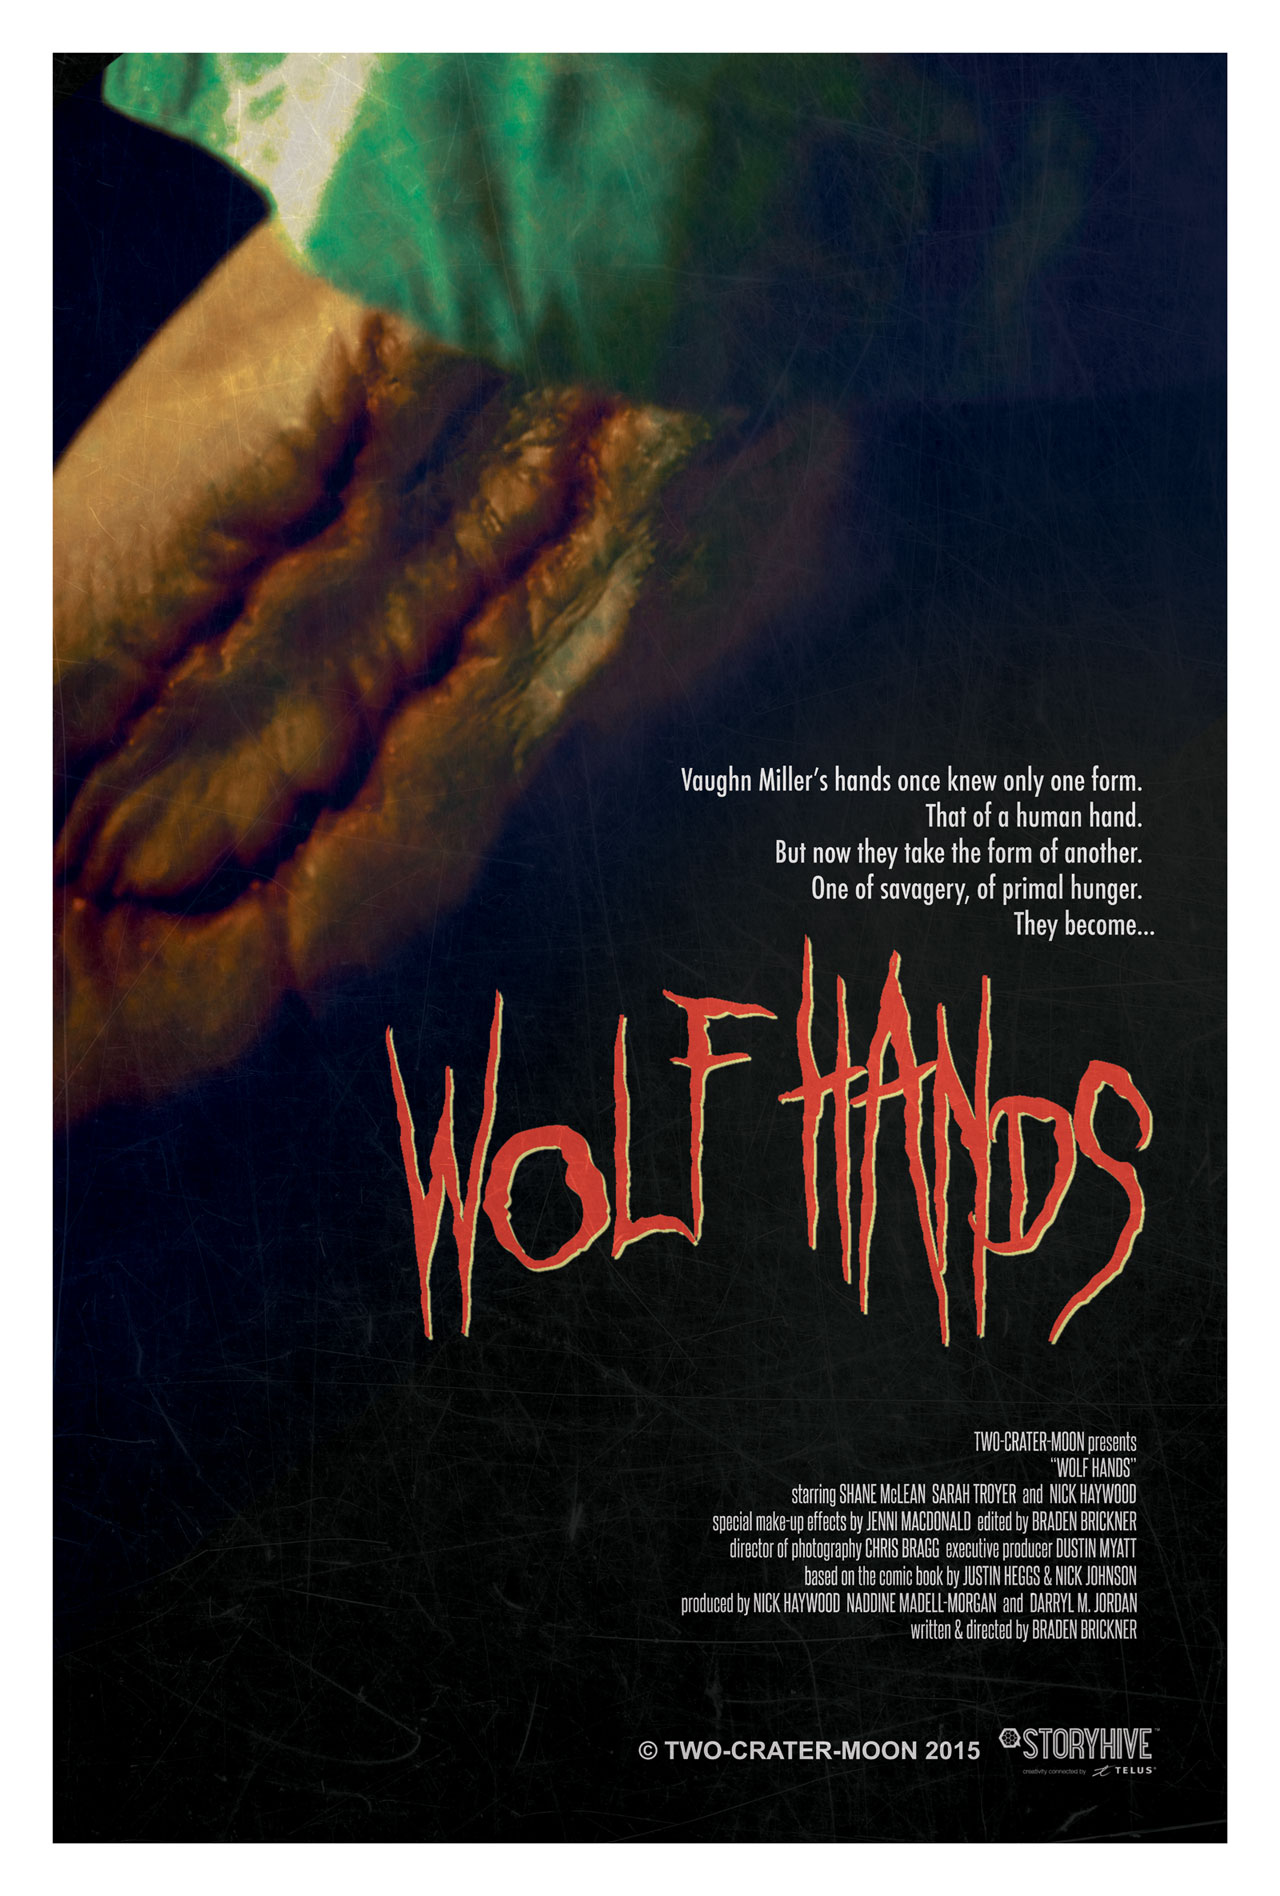 wolfhandsposter